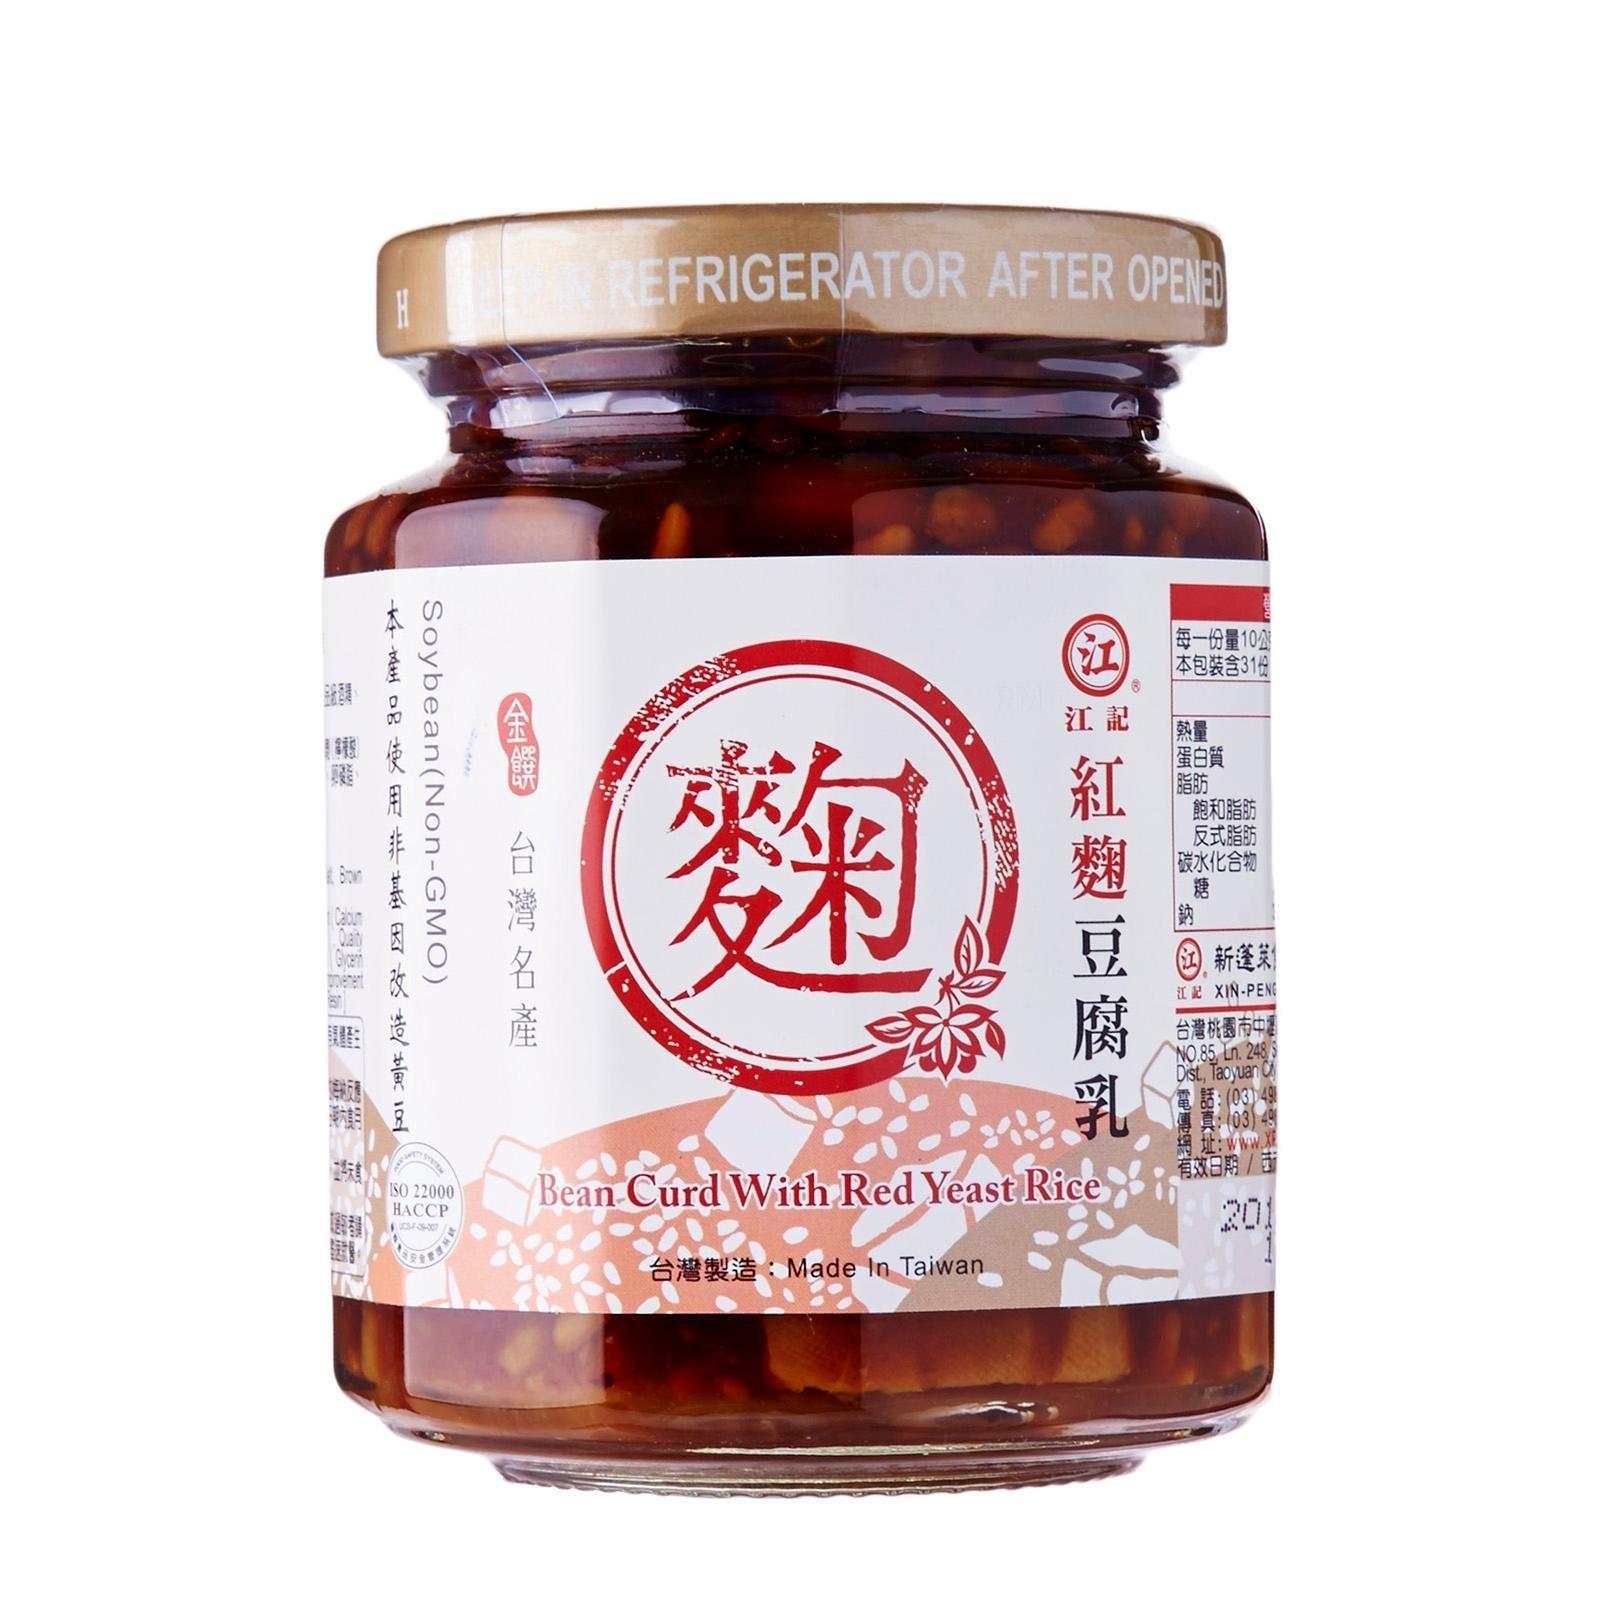 Jiang Ji Fermented Beancurd - Red Yeast Rice